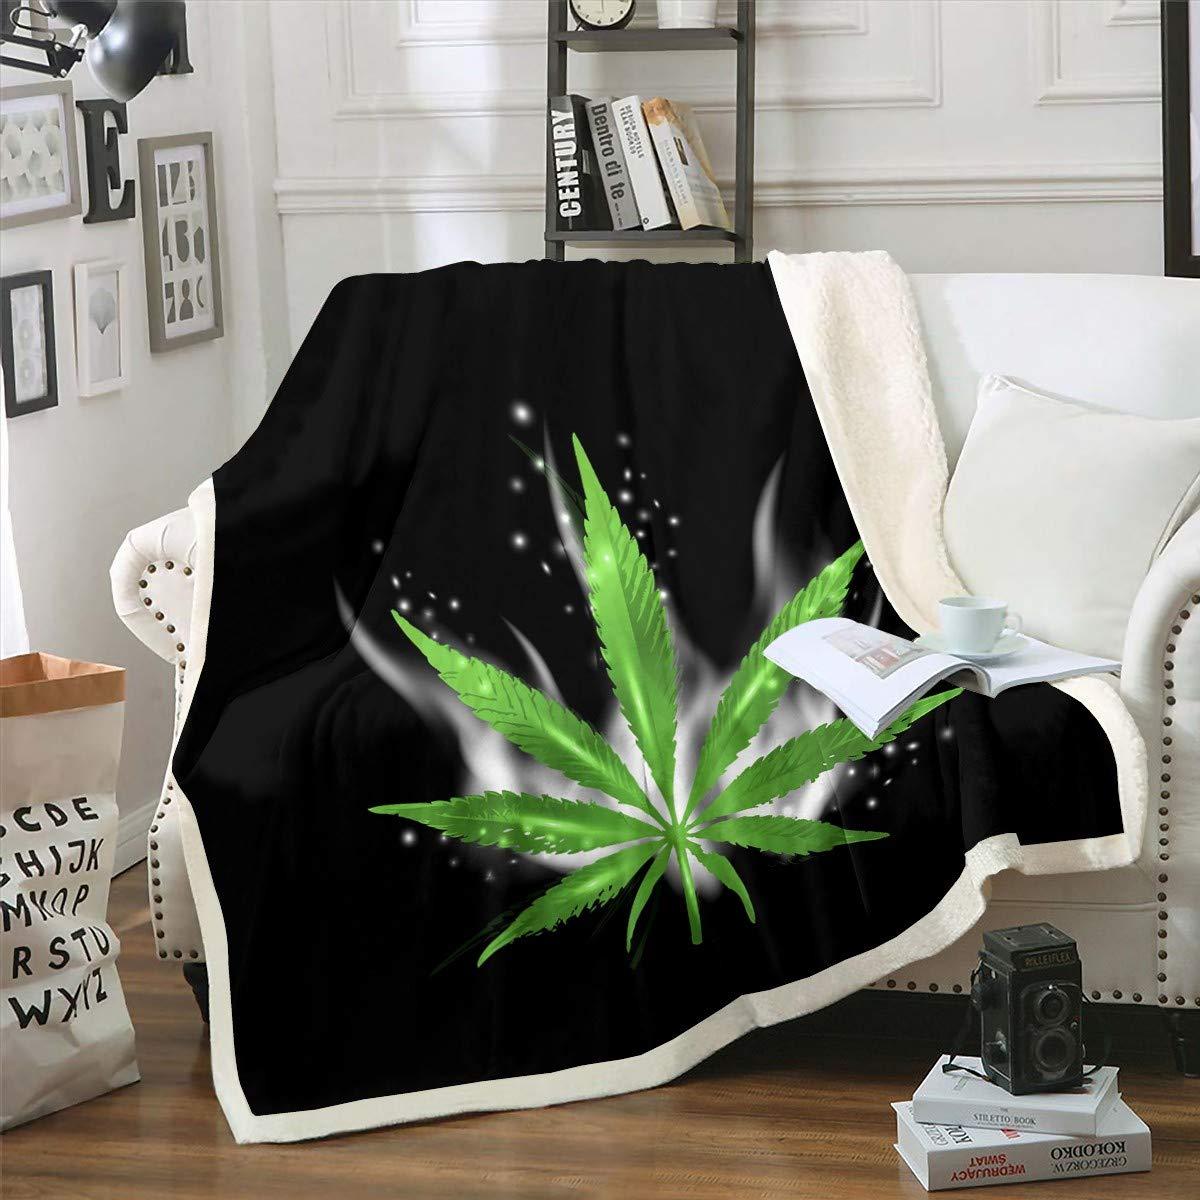 Blatt Fleece Decke für Sofa Bett Couch Unkraut Blatt Plüsch Decke Chic Smoky Blätter Sherpa Decke Grün